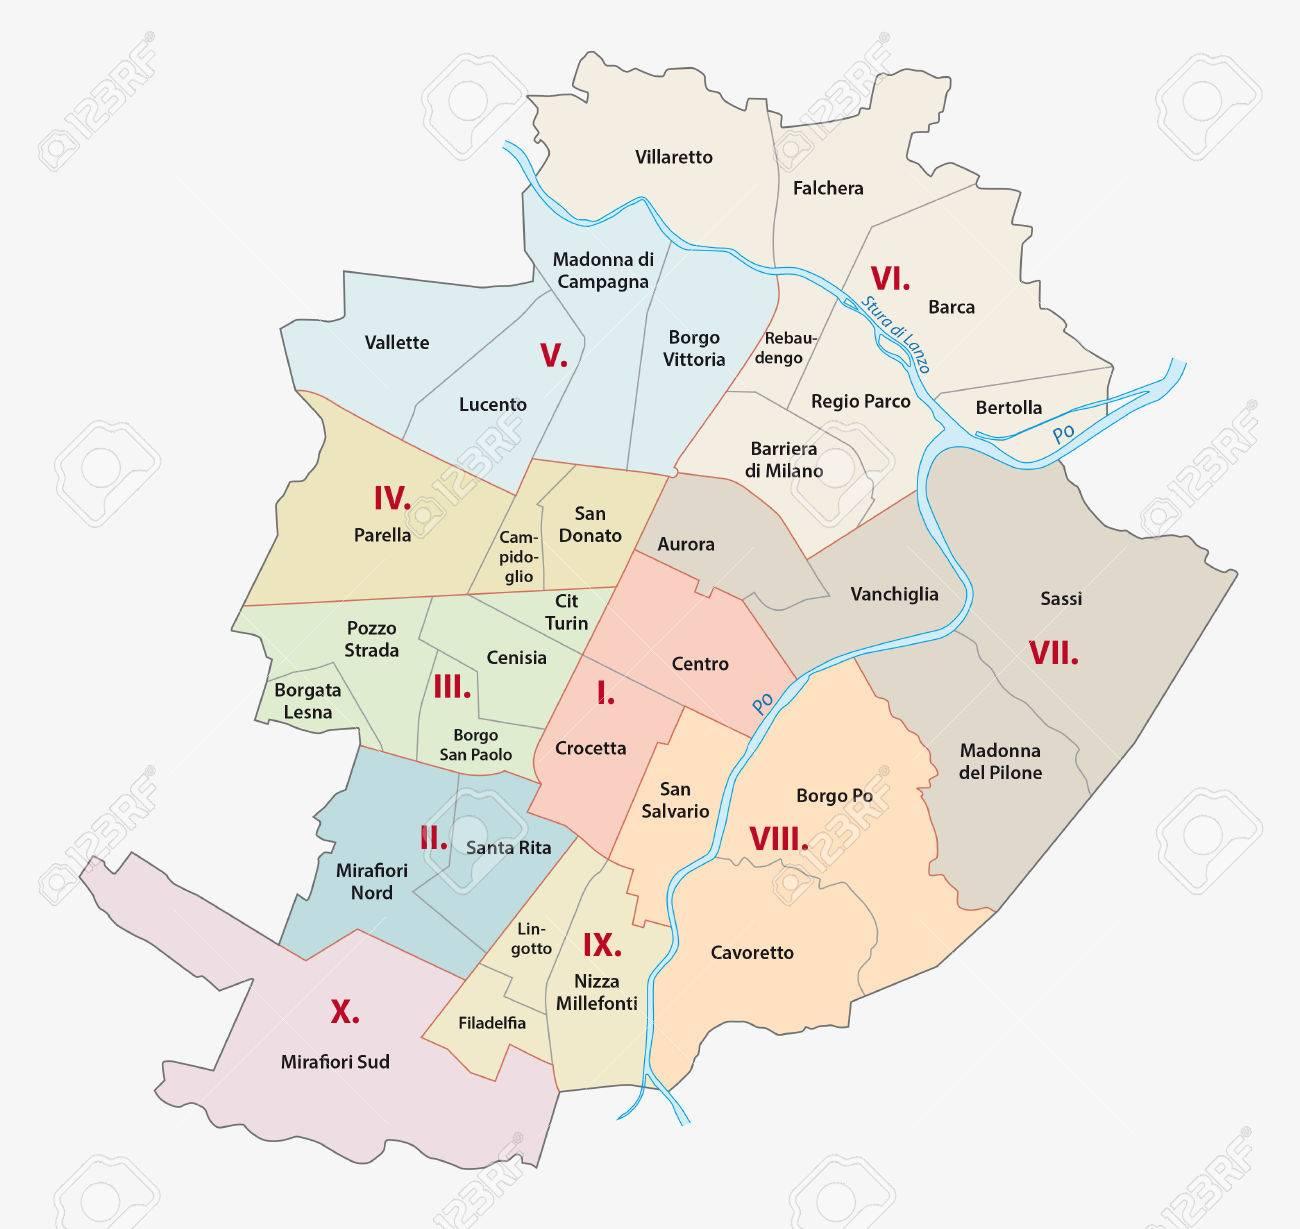 Mapa administrativo turn ilustraciones vectoriales clip art foto de archivo mapa administrativo turn gumiabroncs Choice Image